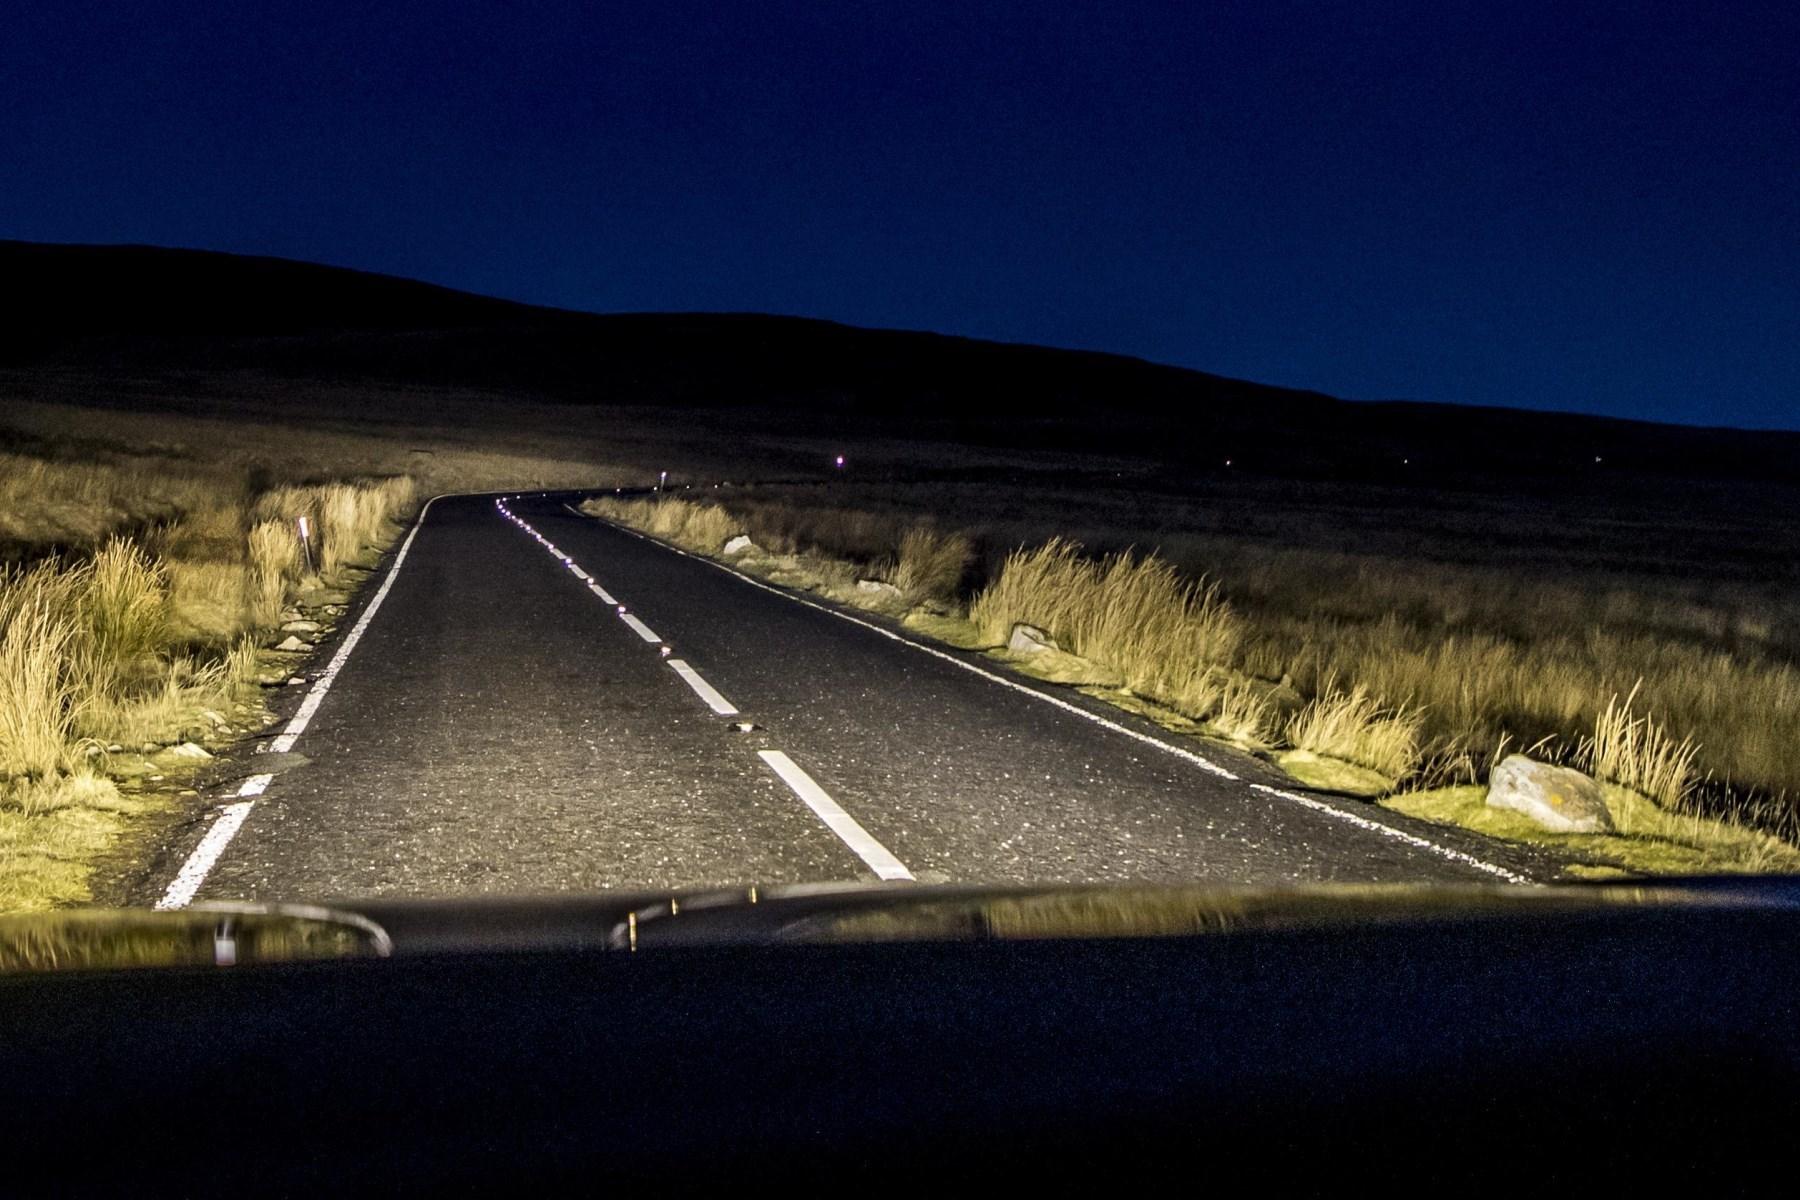 VW Touareg_Black_Edition_night vision.jpg (2)